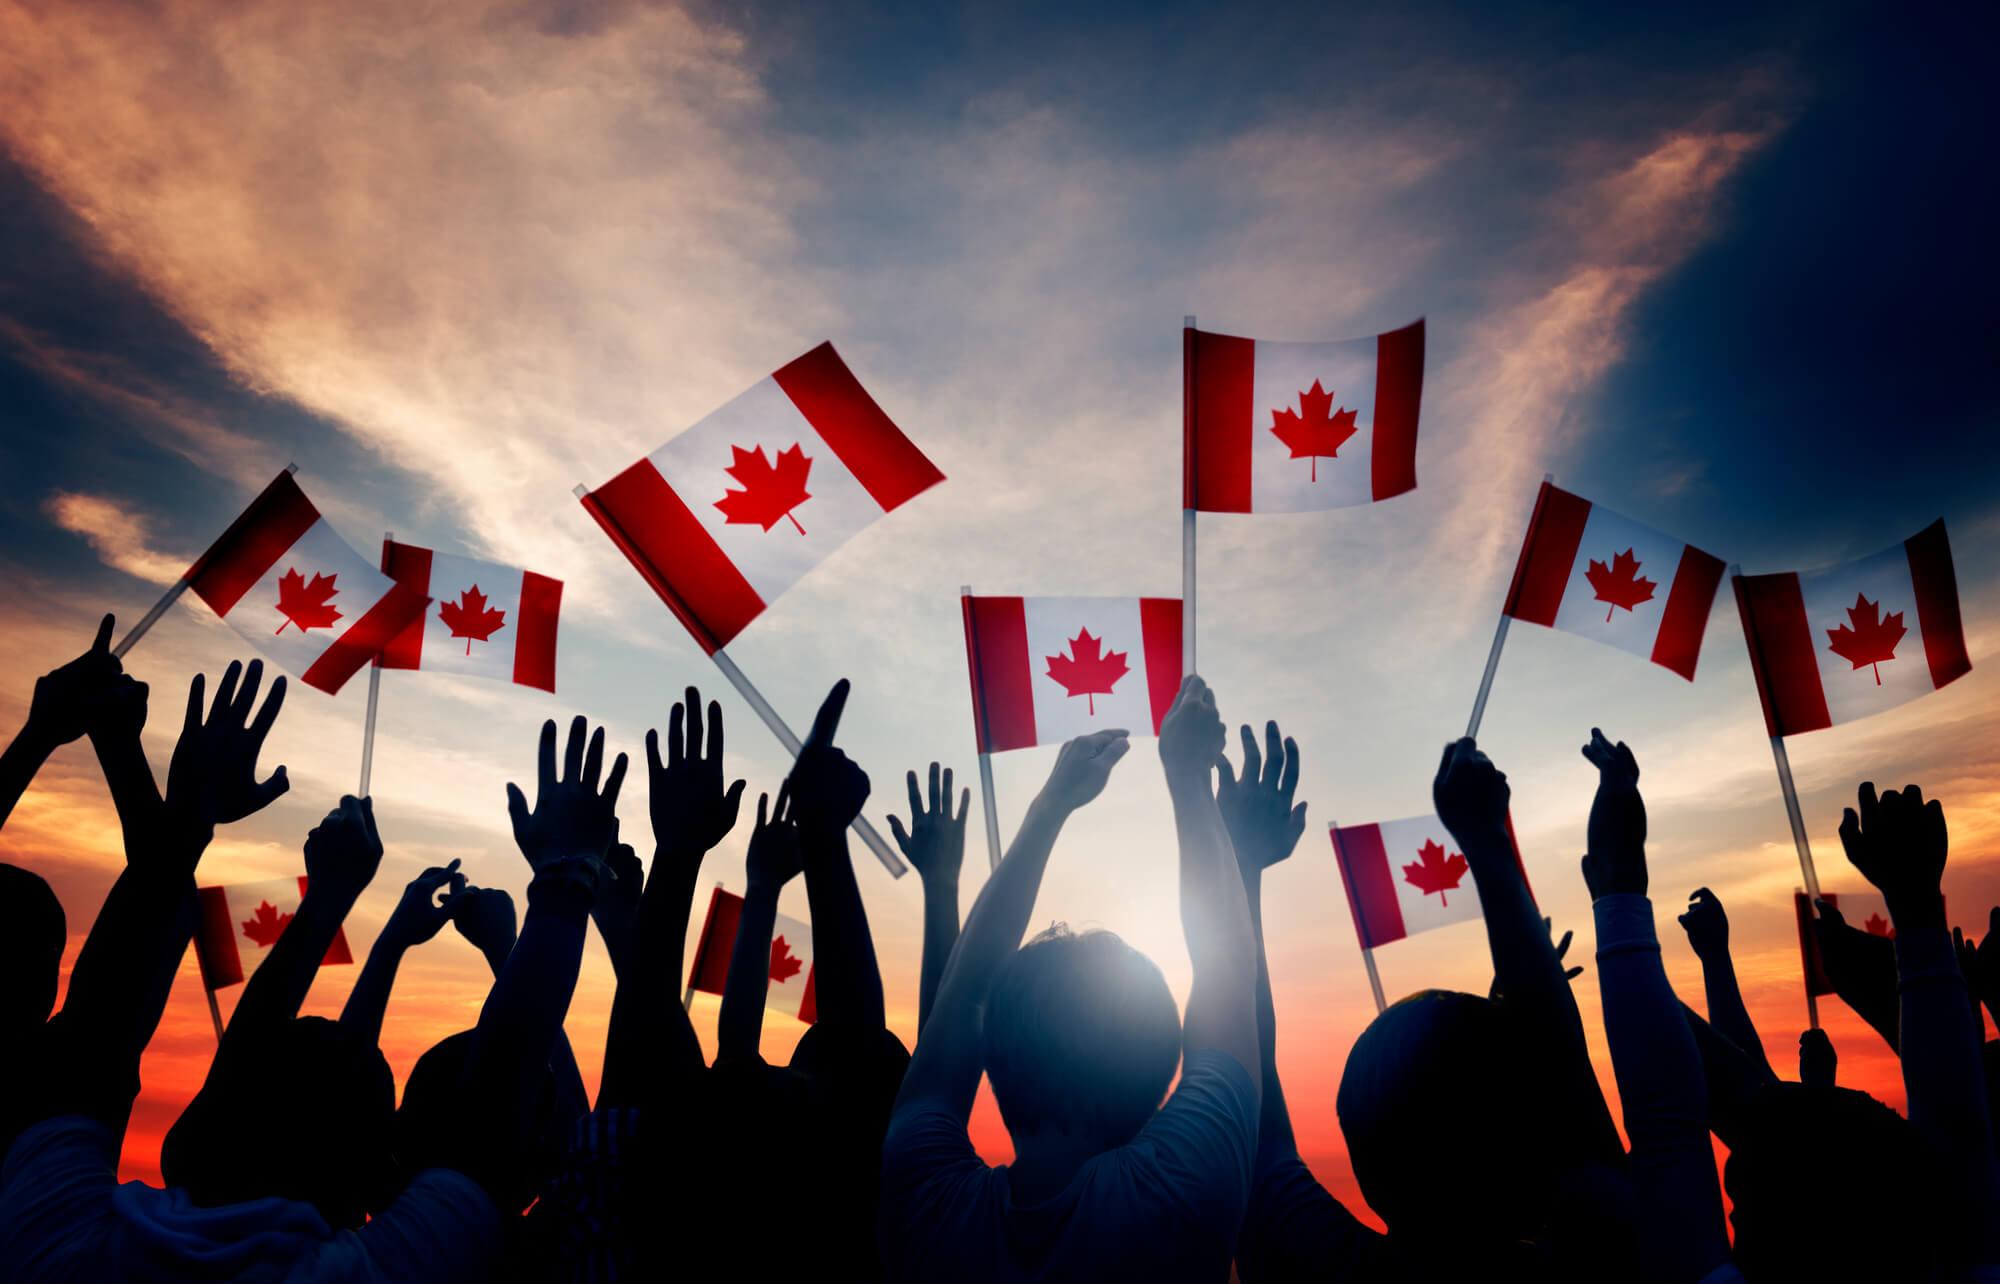 Team Canada Healing Hands Project in Haiti